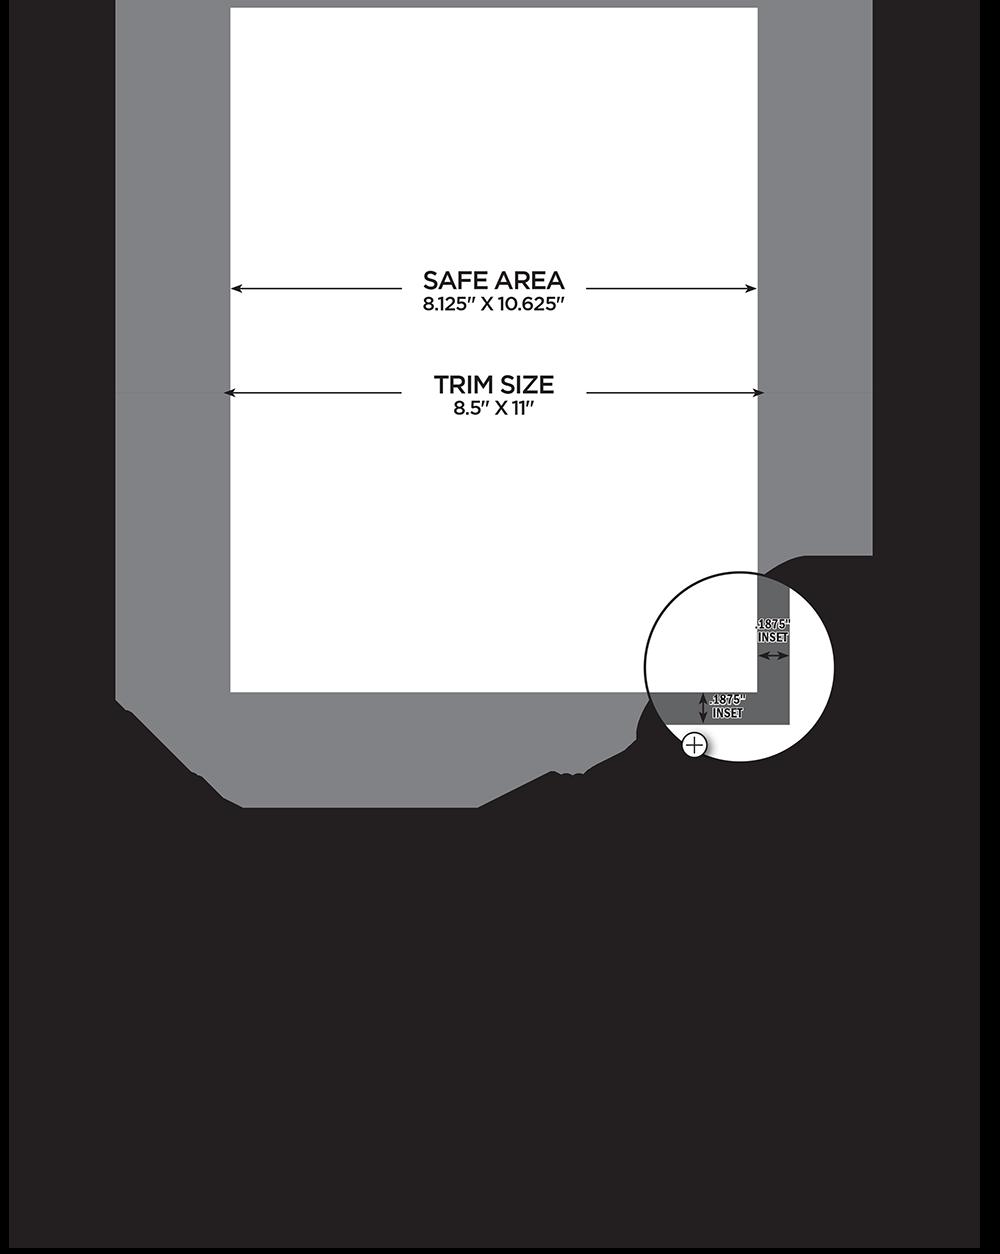 8 5 x 11 brochure template - s flyer ross4marketing a print eddm signage